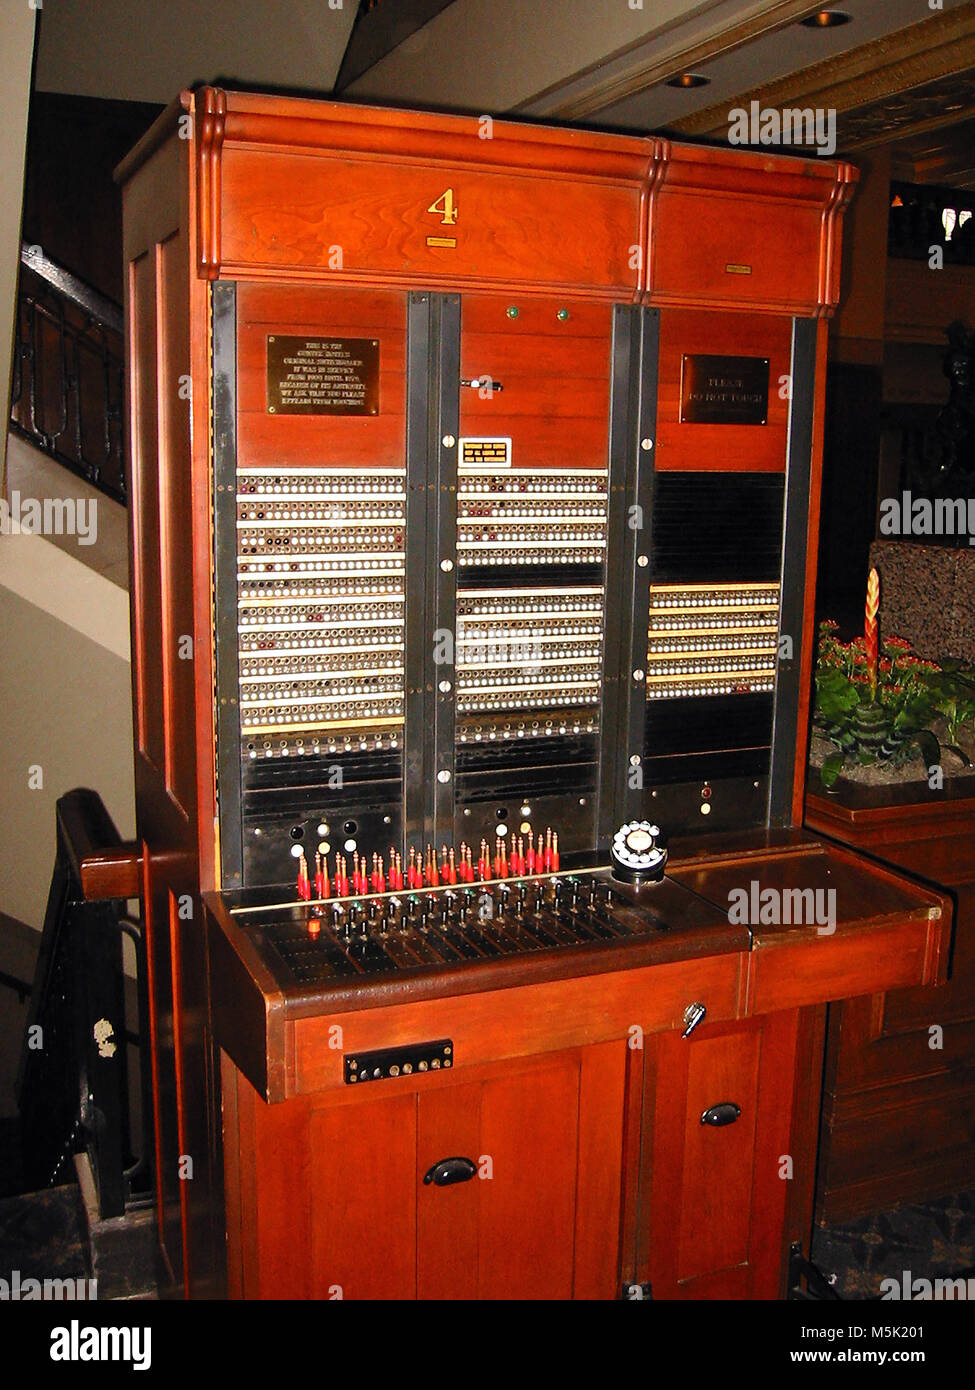 Treasury casino switchboard